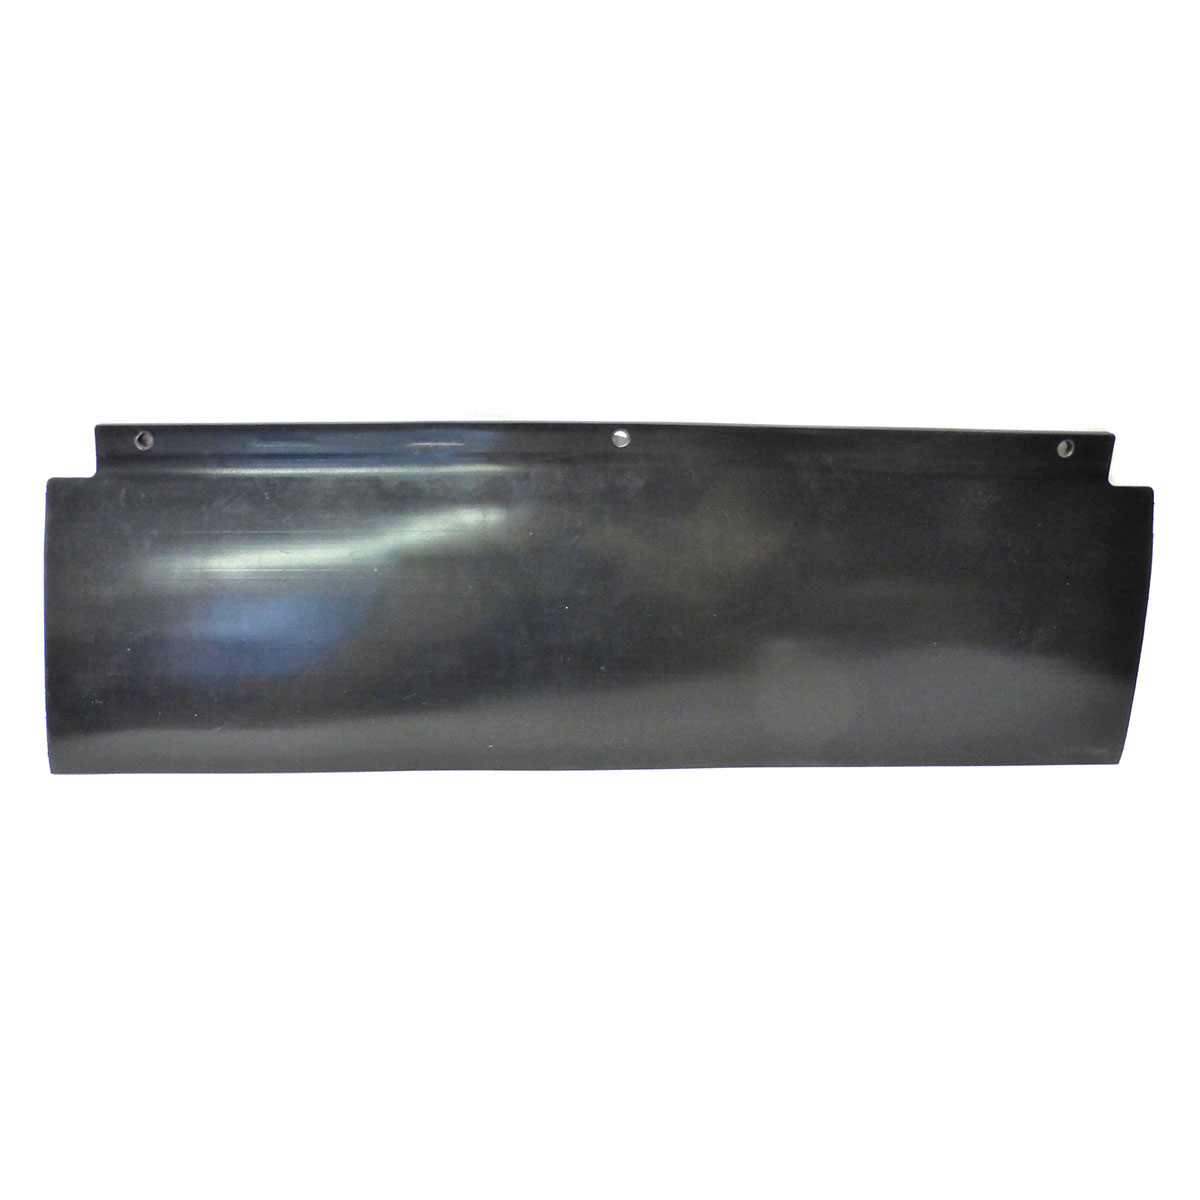 Briggs /& Stratton Genuine 7101553YP DEFLECTOR REAR Replacement Part